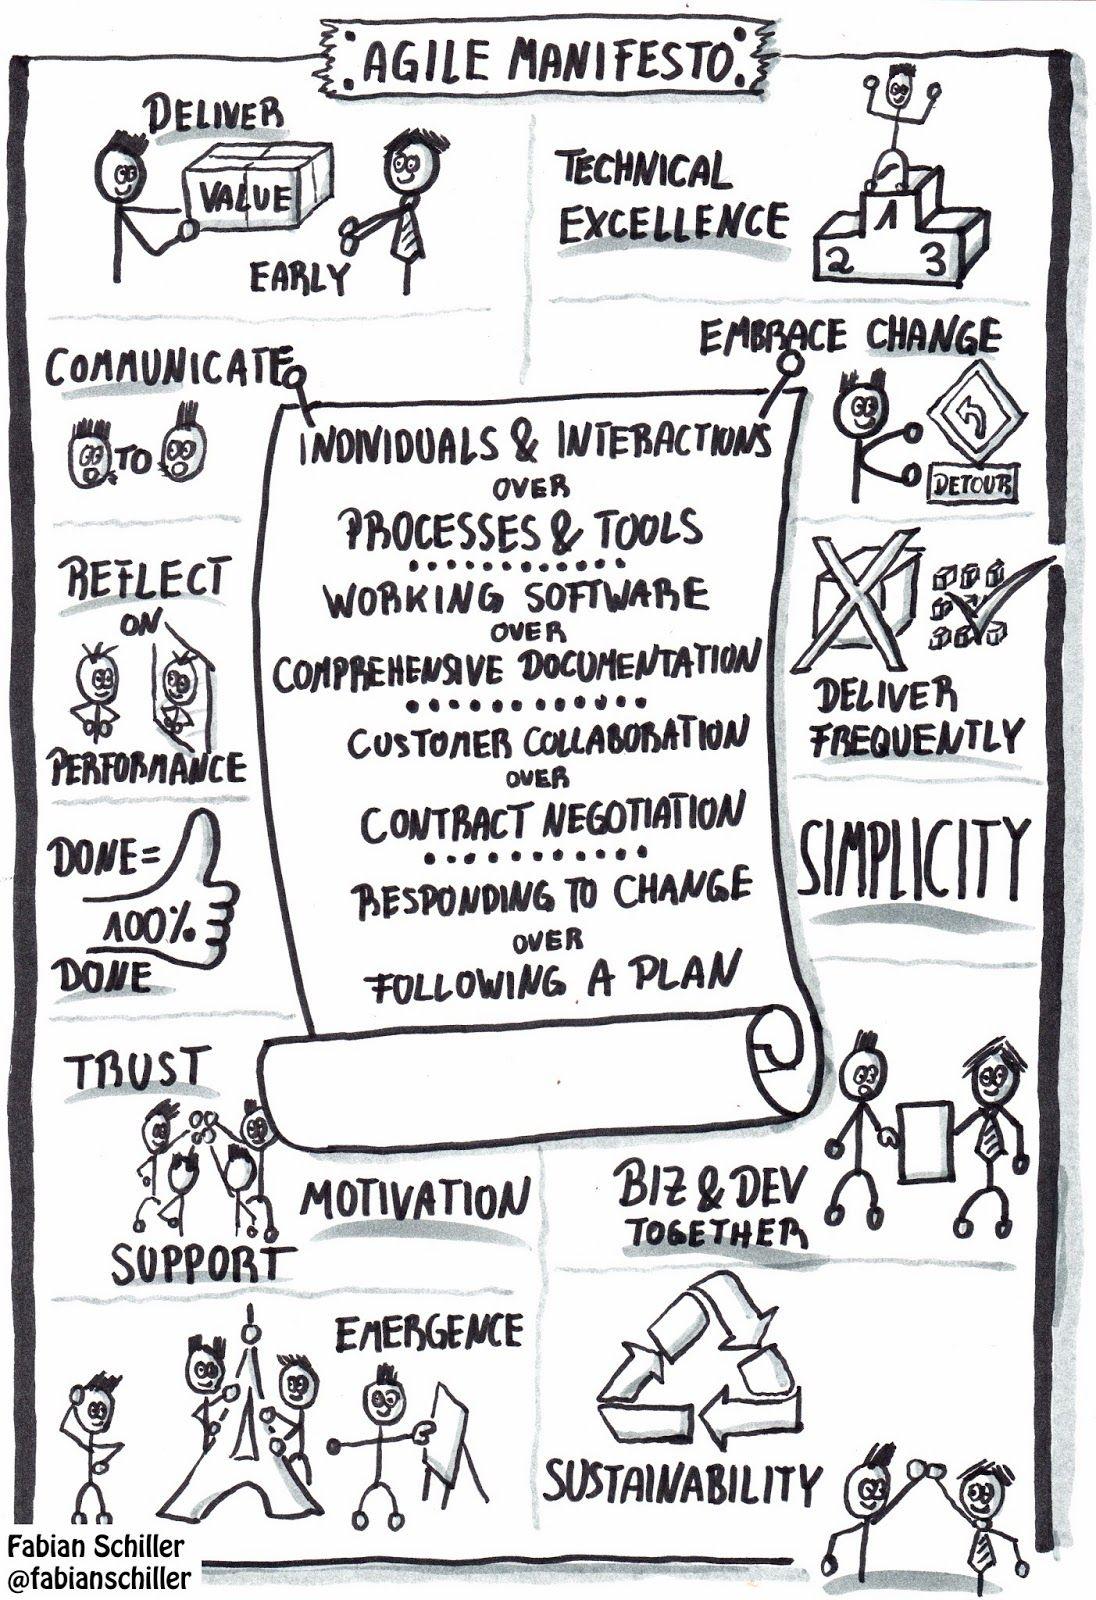 Agile Manifesto On One Page Agile Project Management Agile Project Management Templates Agile Process